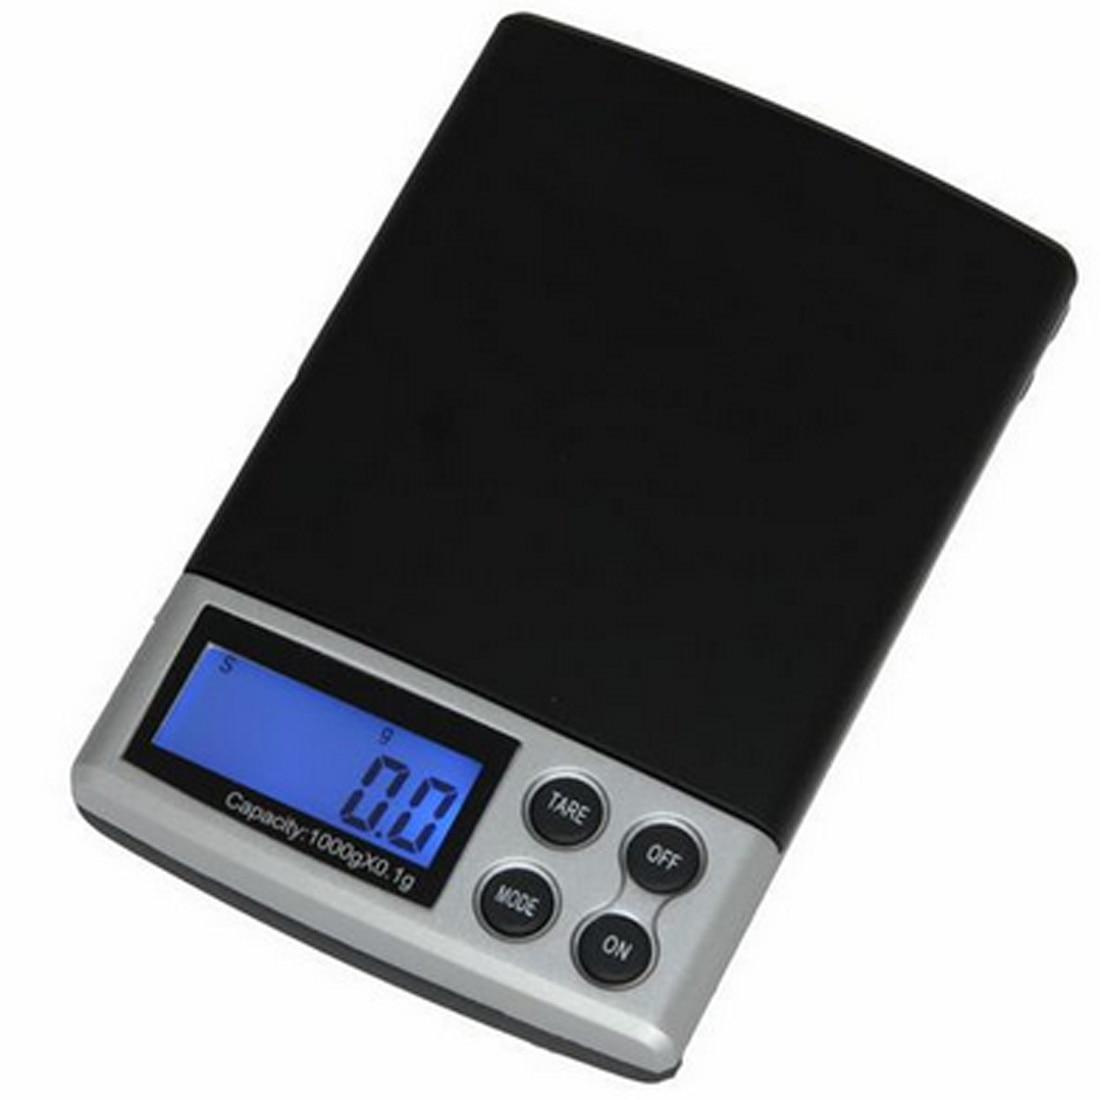 1pc 500g x 0.01g Escala de precisión digital Oro Plata Joyería - Instrumentos de medición - foto 5